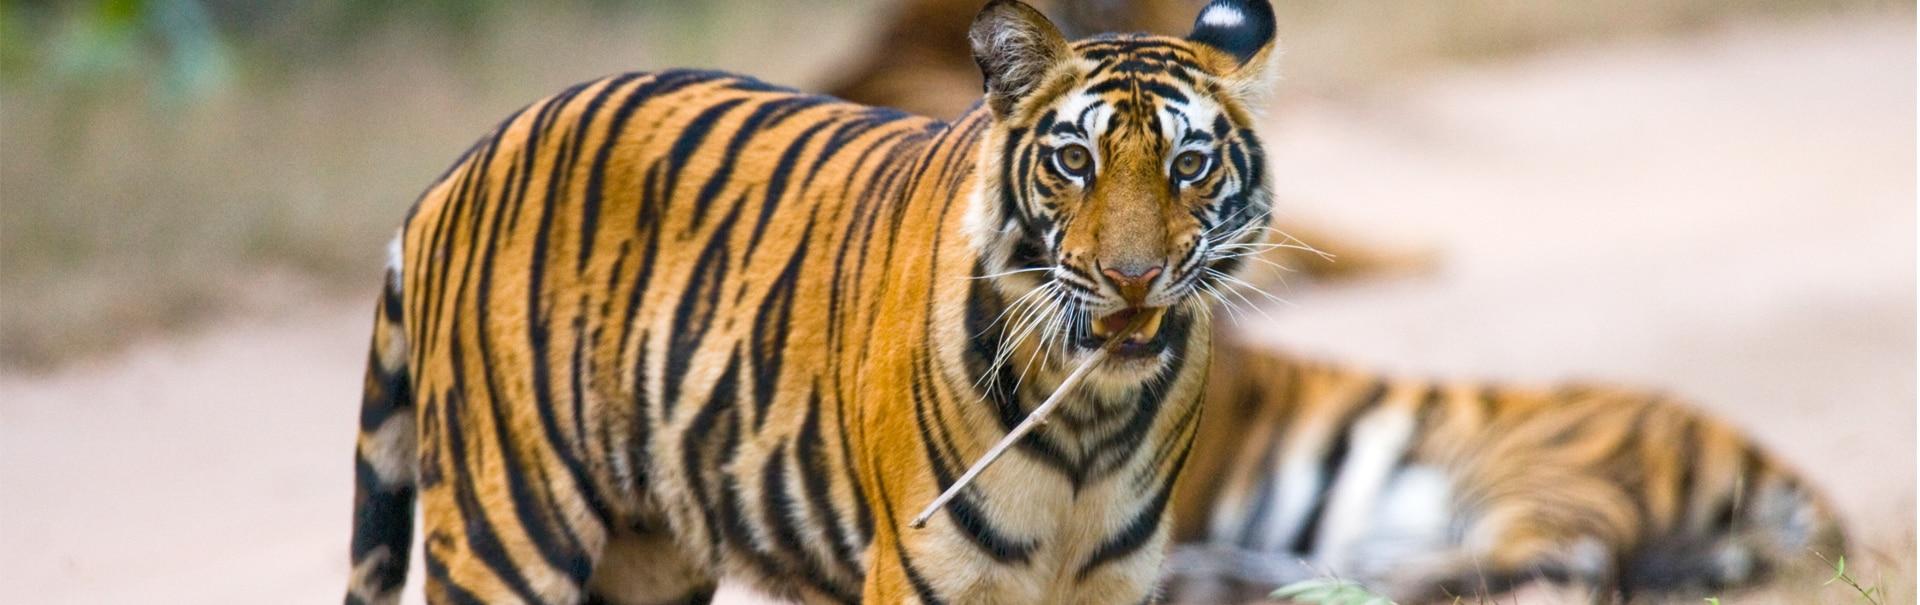 Temples, Wildlife and Nature of Madhya Pradesh (SHMP13) Banner